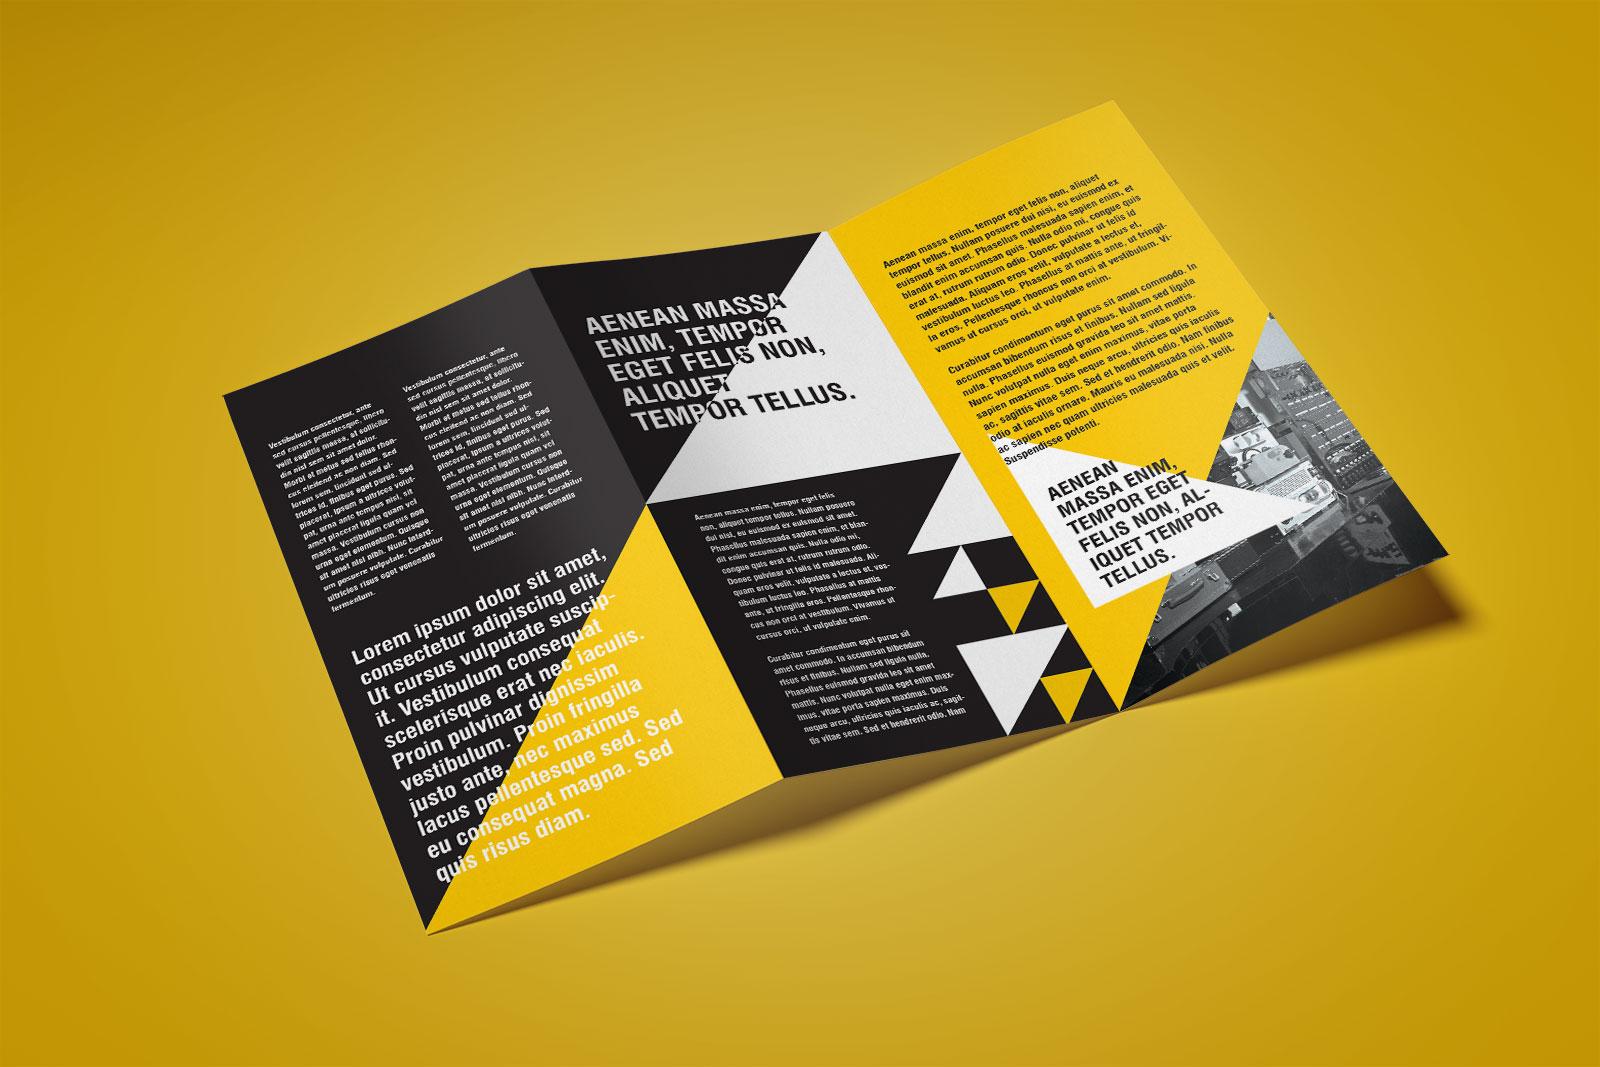 Free-Z-Fold-Brochure-Mockup-PSD-file-3